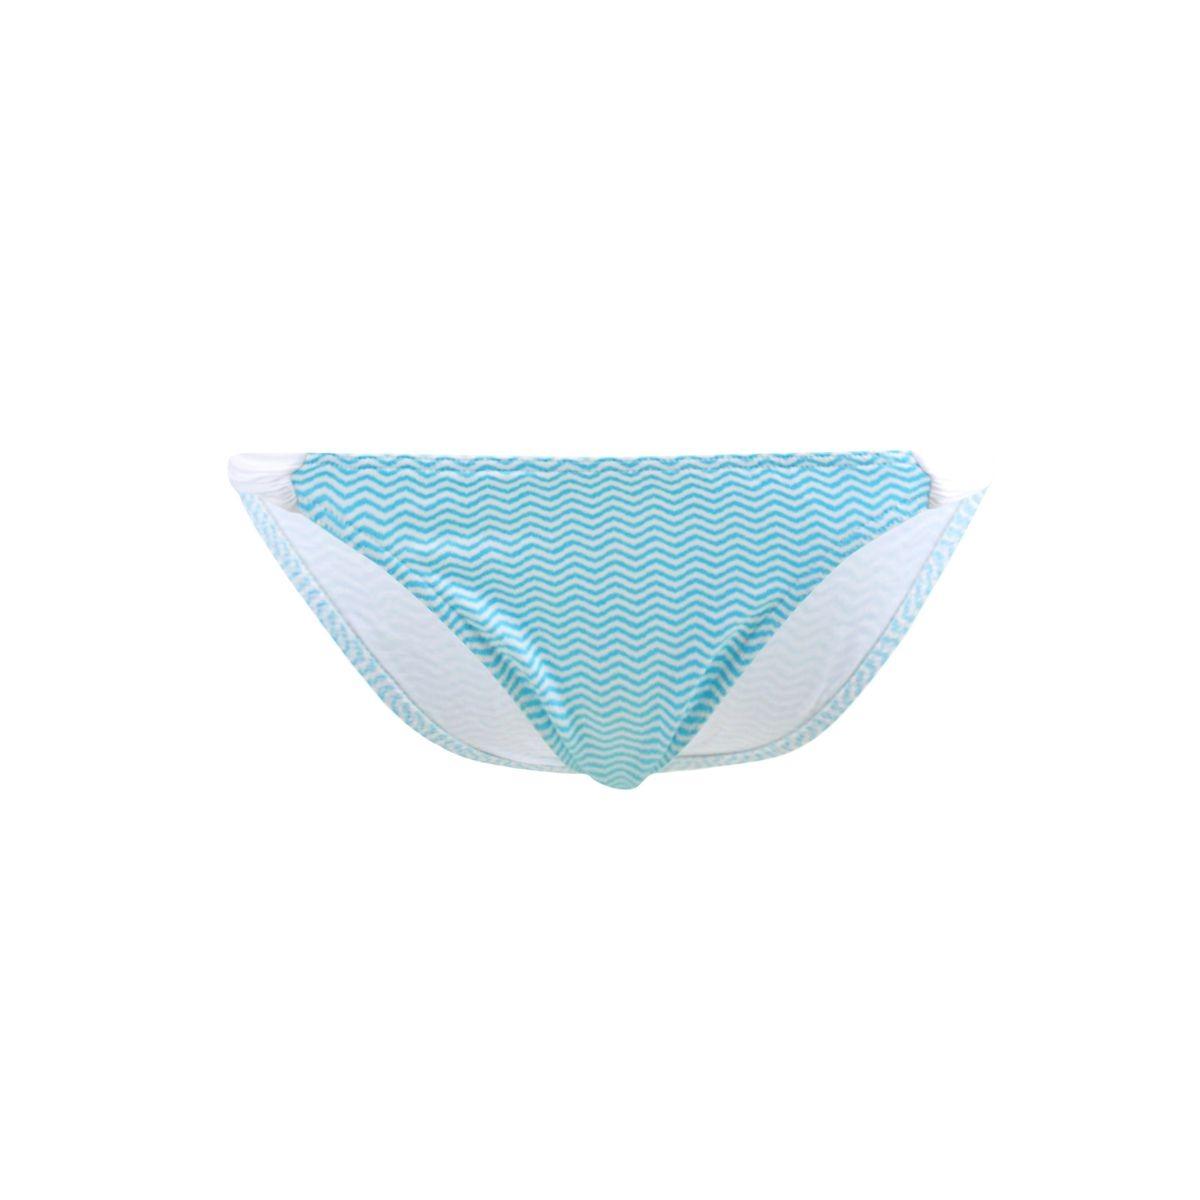 Maillot de bain Culotte Trendy Wavetrip (bas)